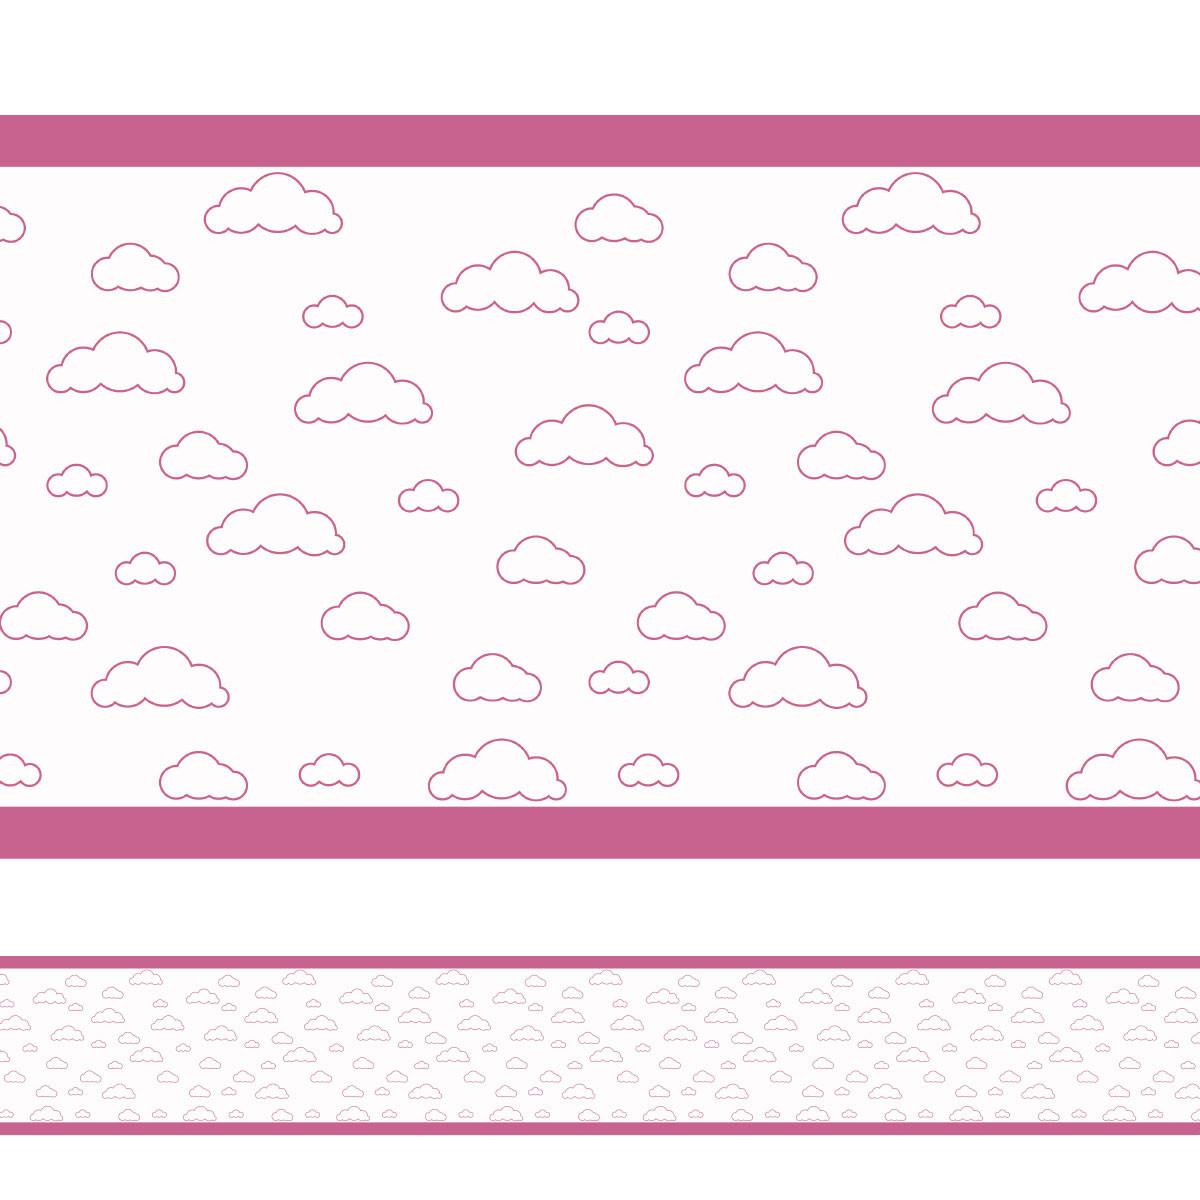 Faixa Decorativa Nuvens Simples Rosa